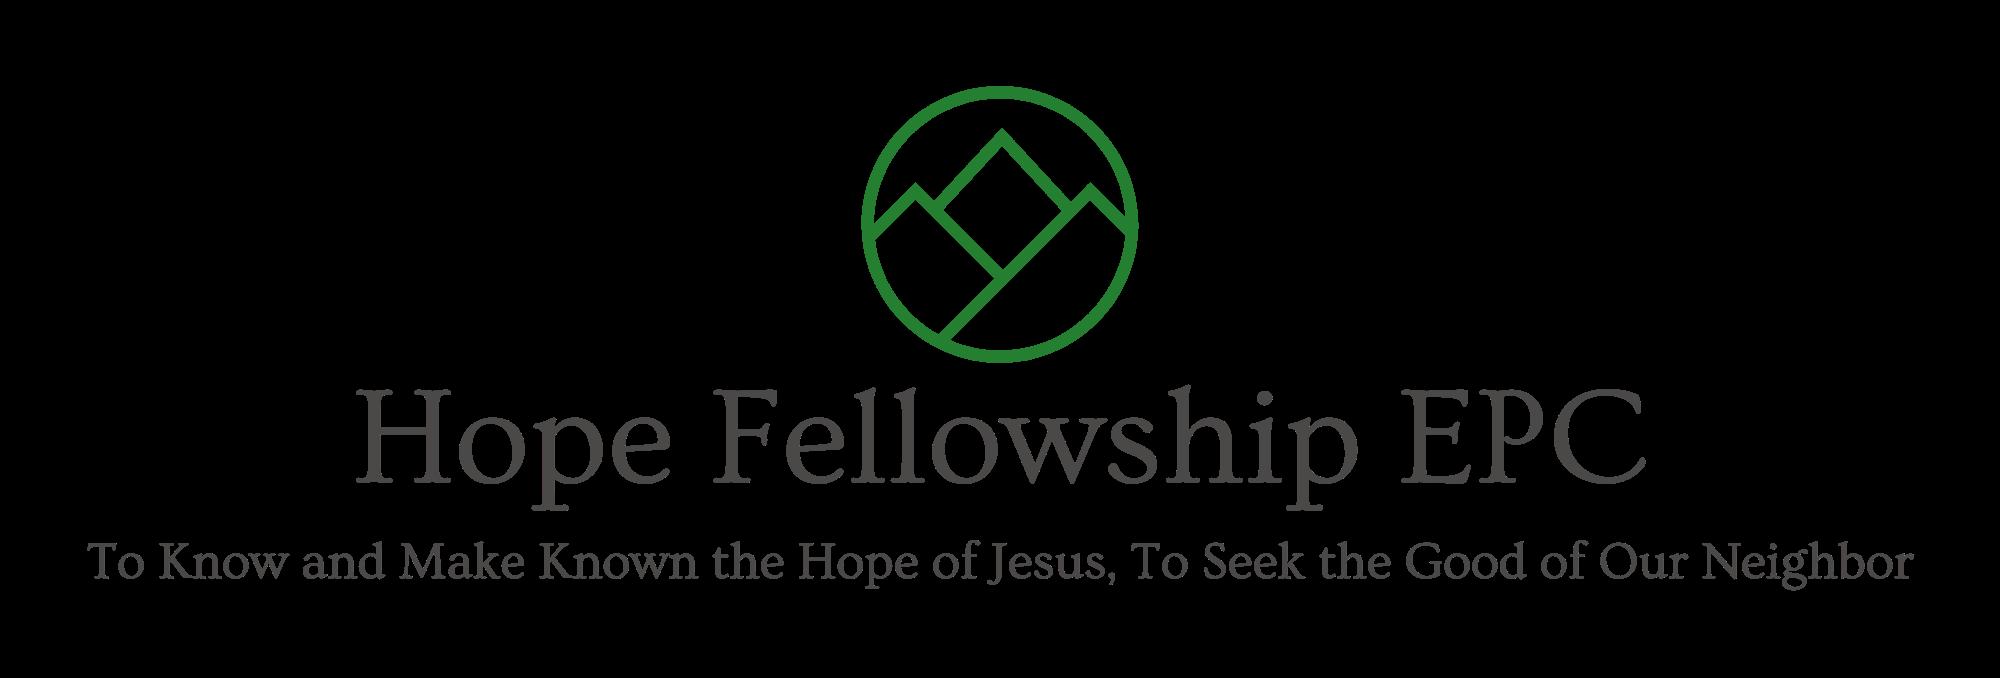 Hope Fellowship EPC-logo (1).png